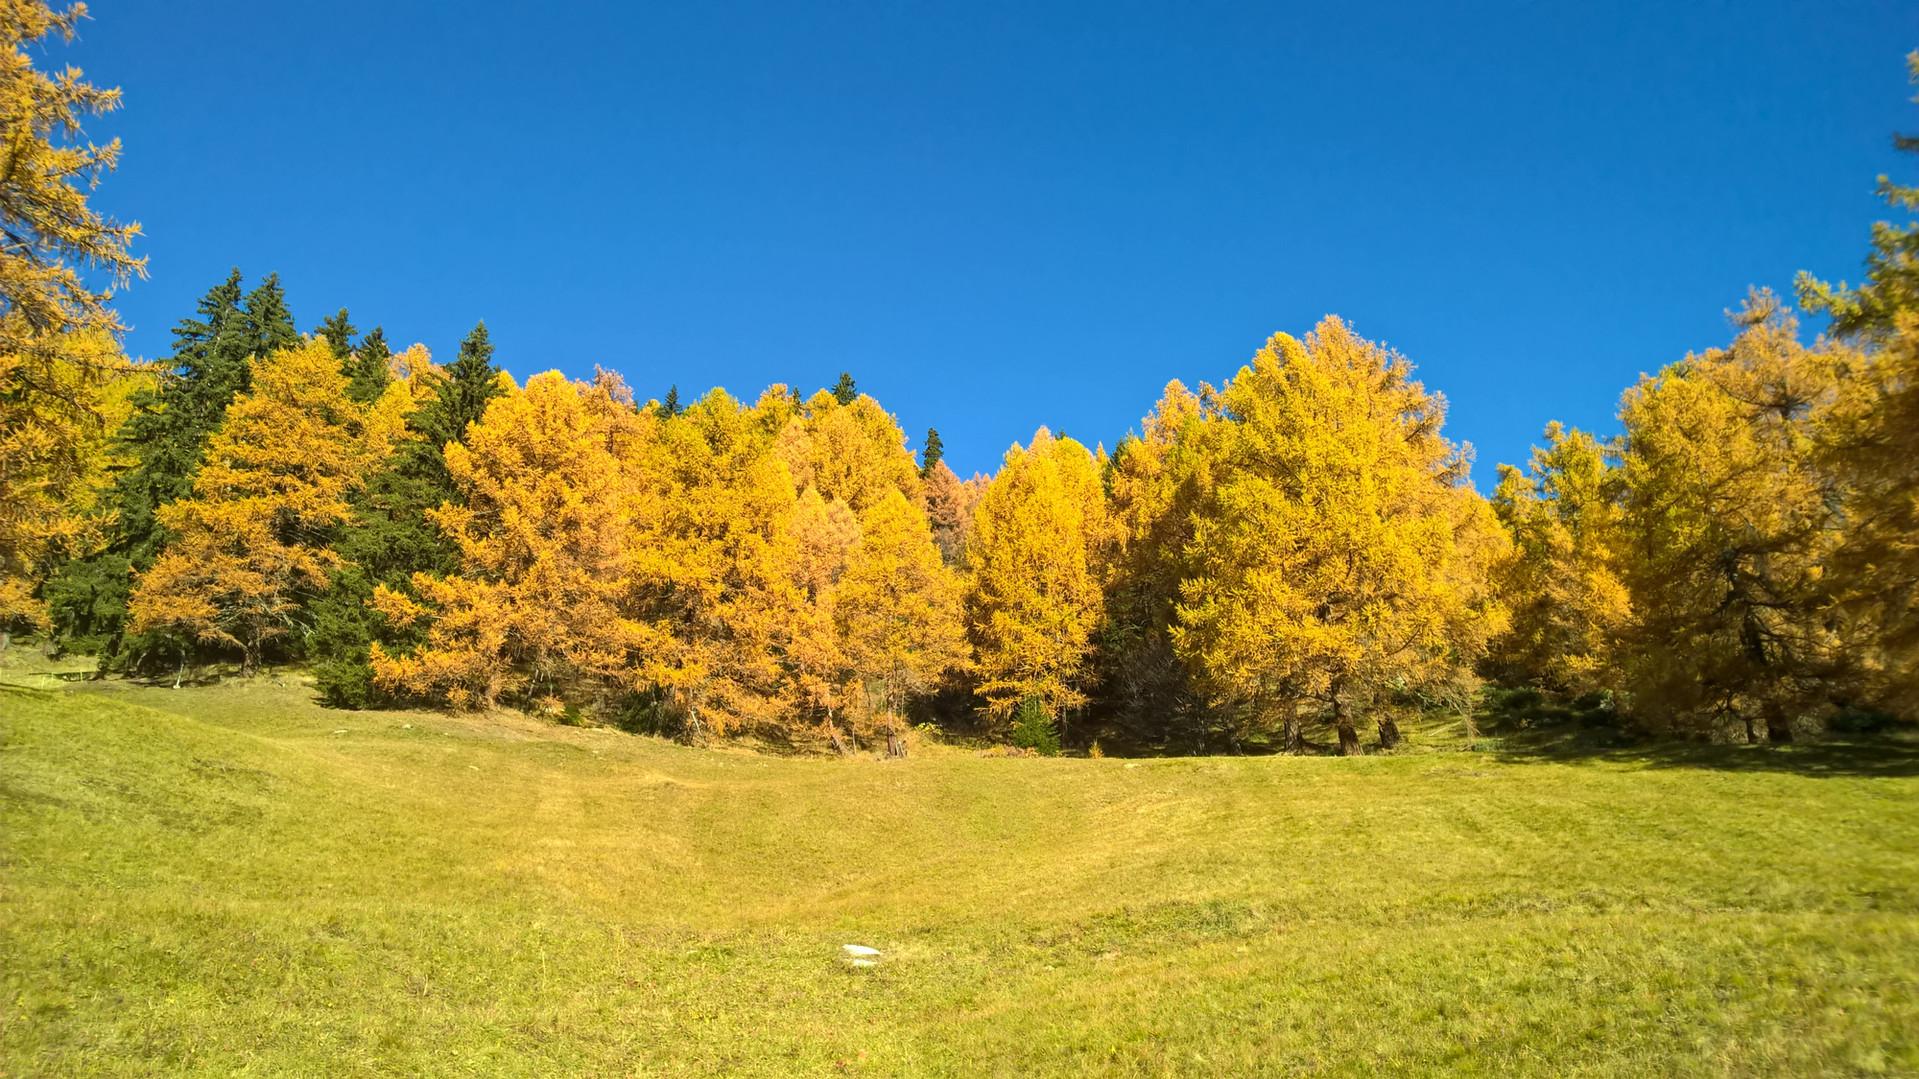 A_Herbst.jpg